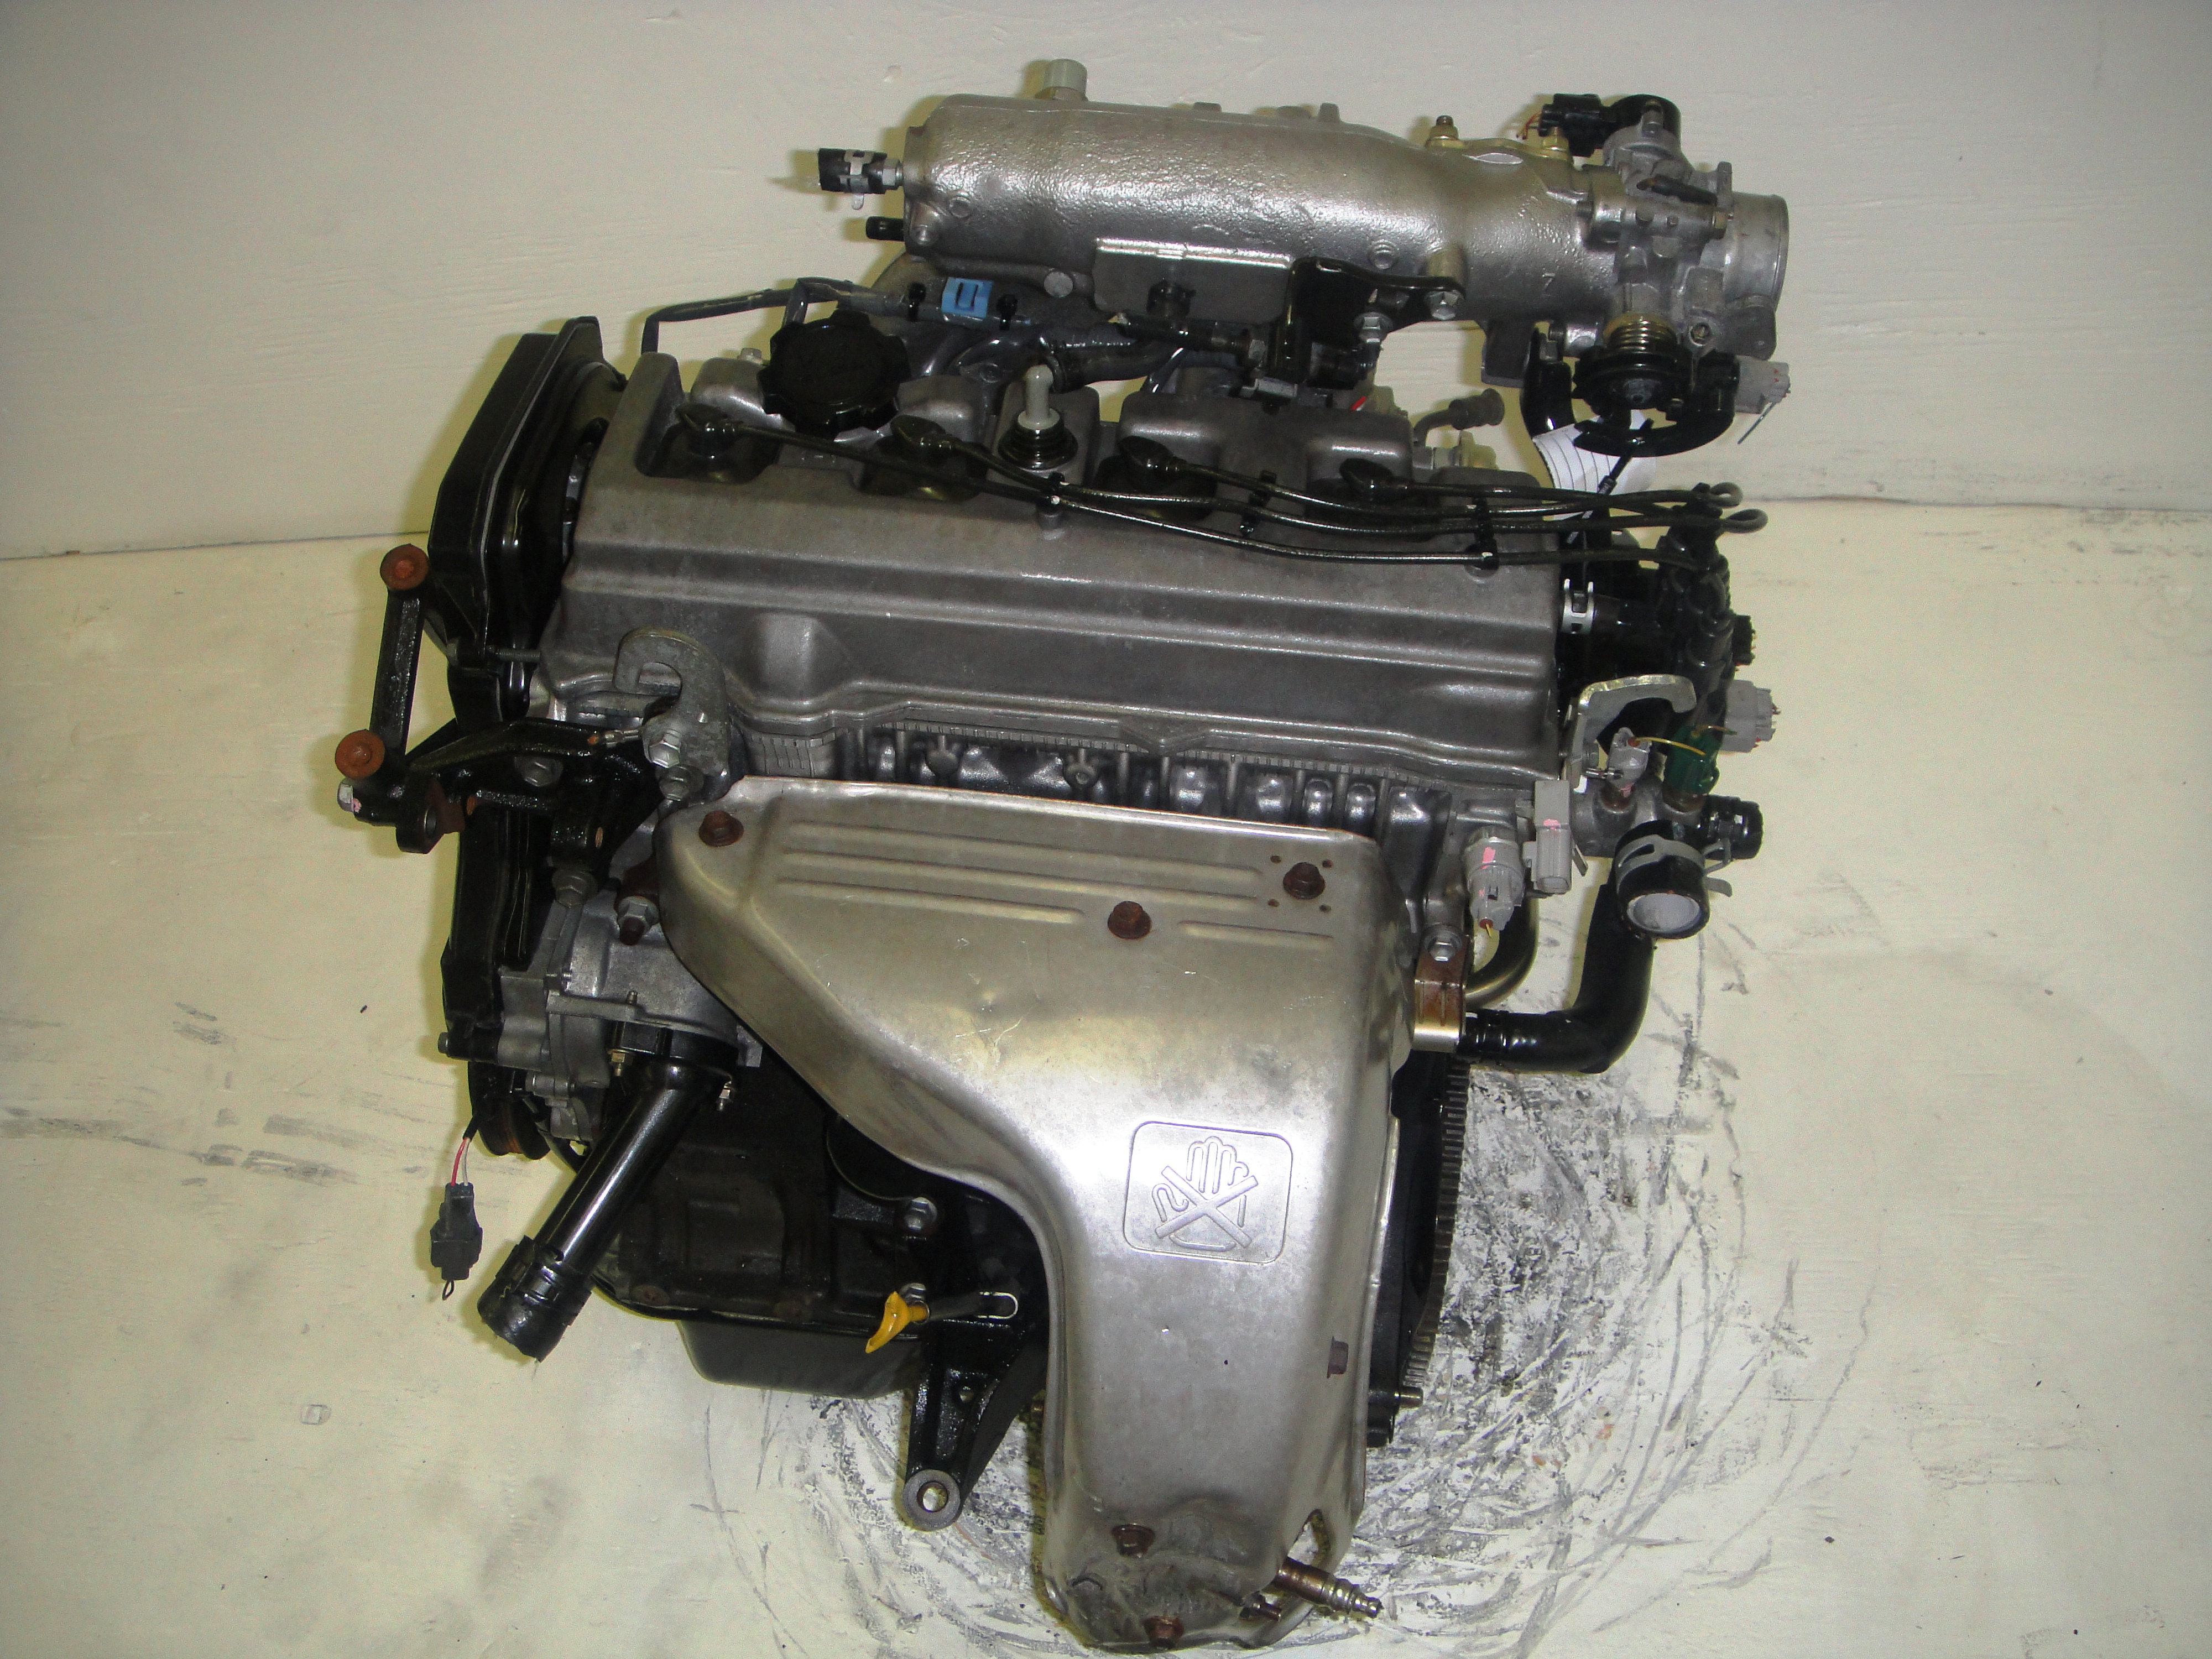 5sfe Motor Diagram Great Design Of Wiring Celica Engine 1997 Toyota Tercel 1 5 Liter Nissan Maxima Mr2 Monster 1992 Gt